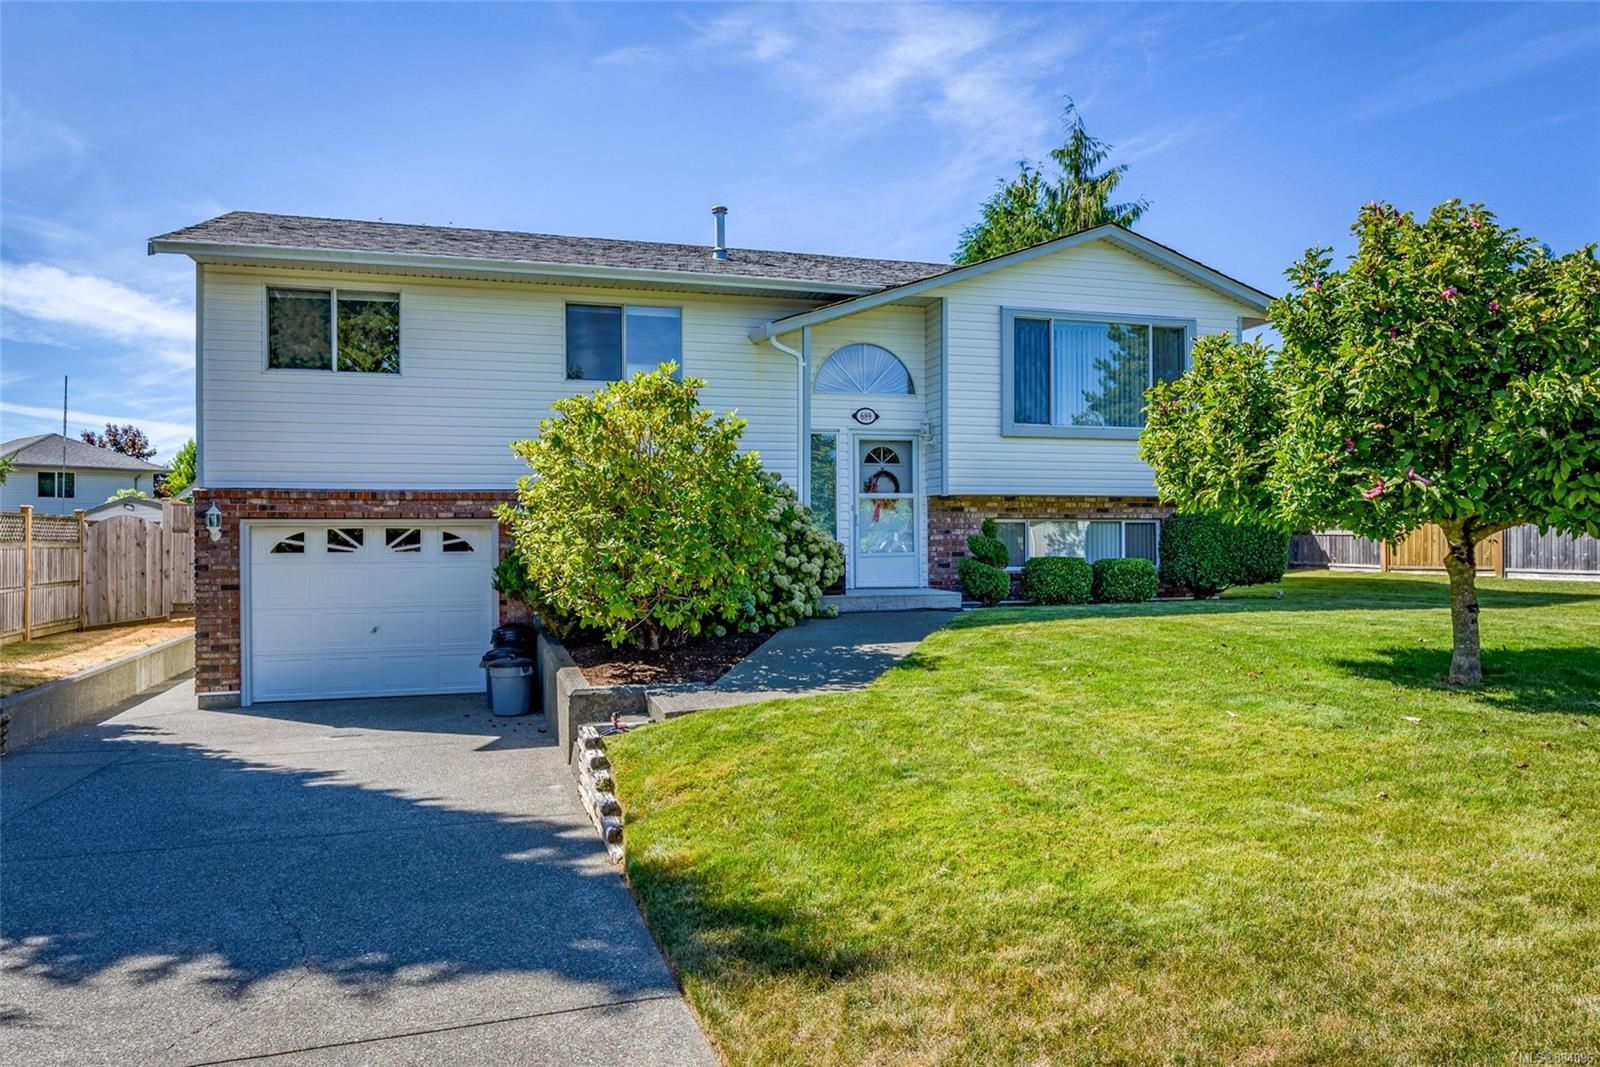 Main Photo: 689 Murrelet Dr in : CV Comox (Town of) House for sale (Comox Valley)  : MLS®# 884096